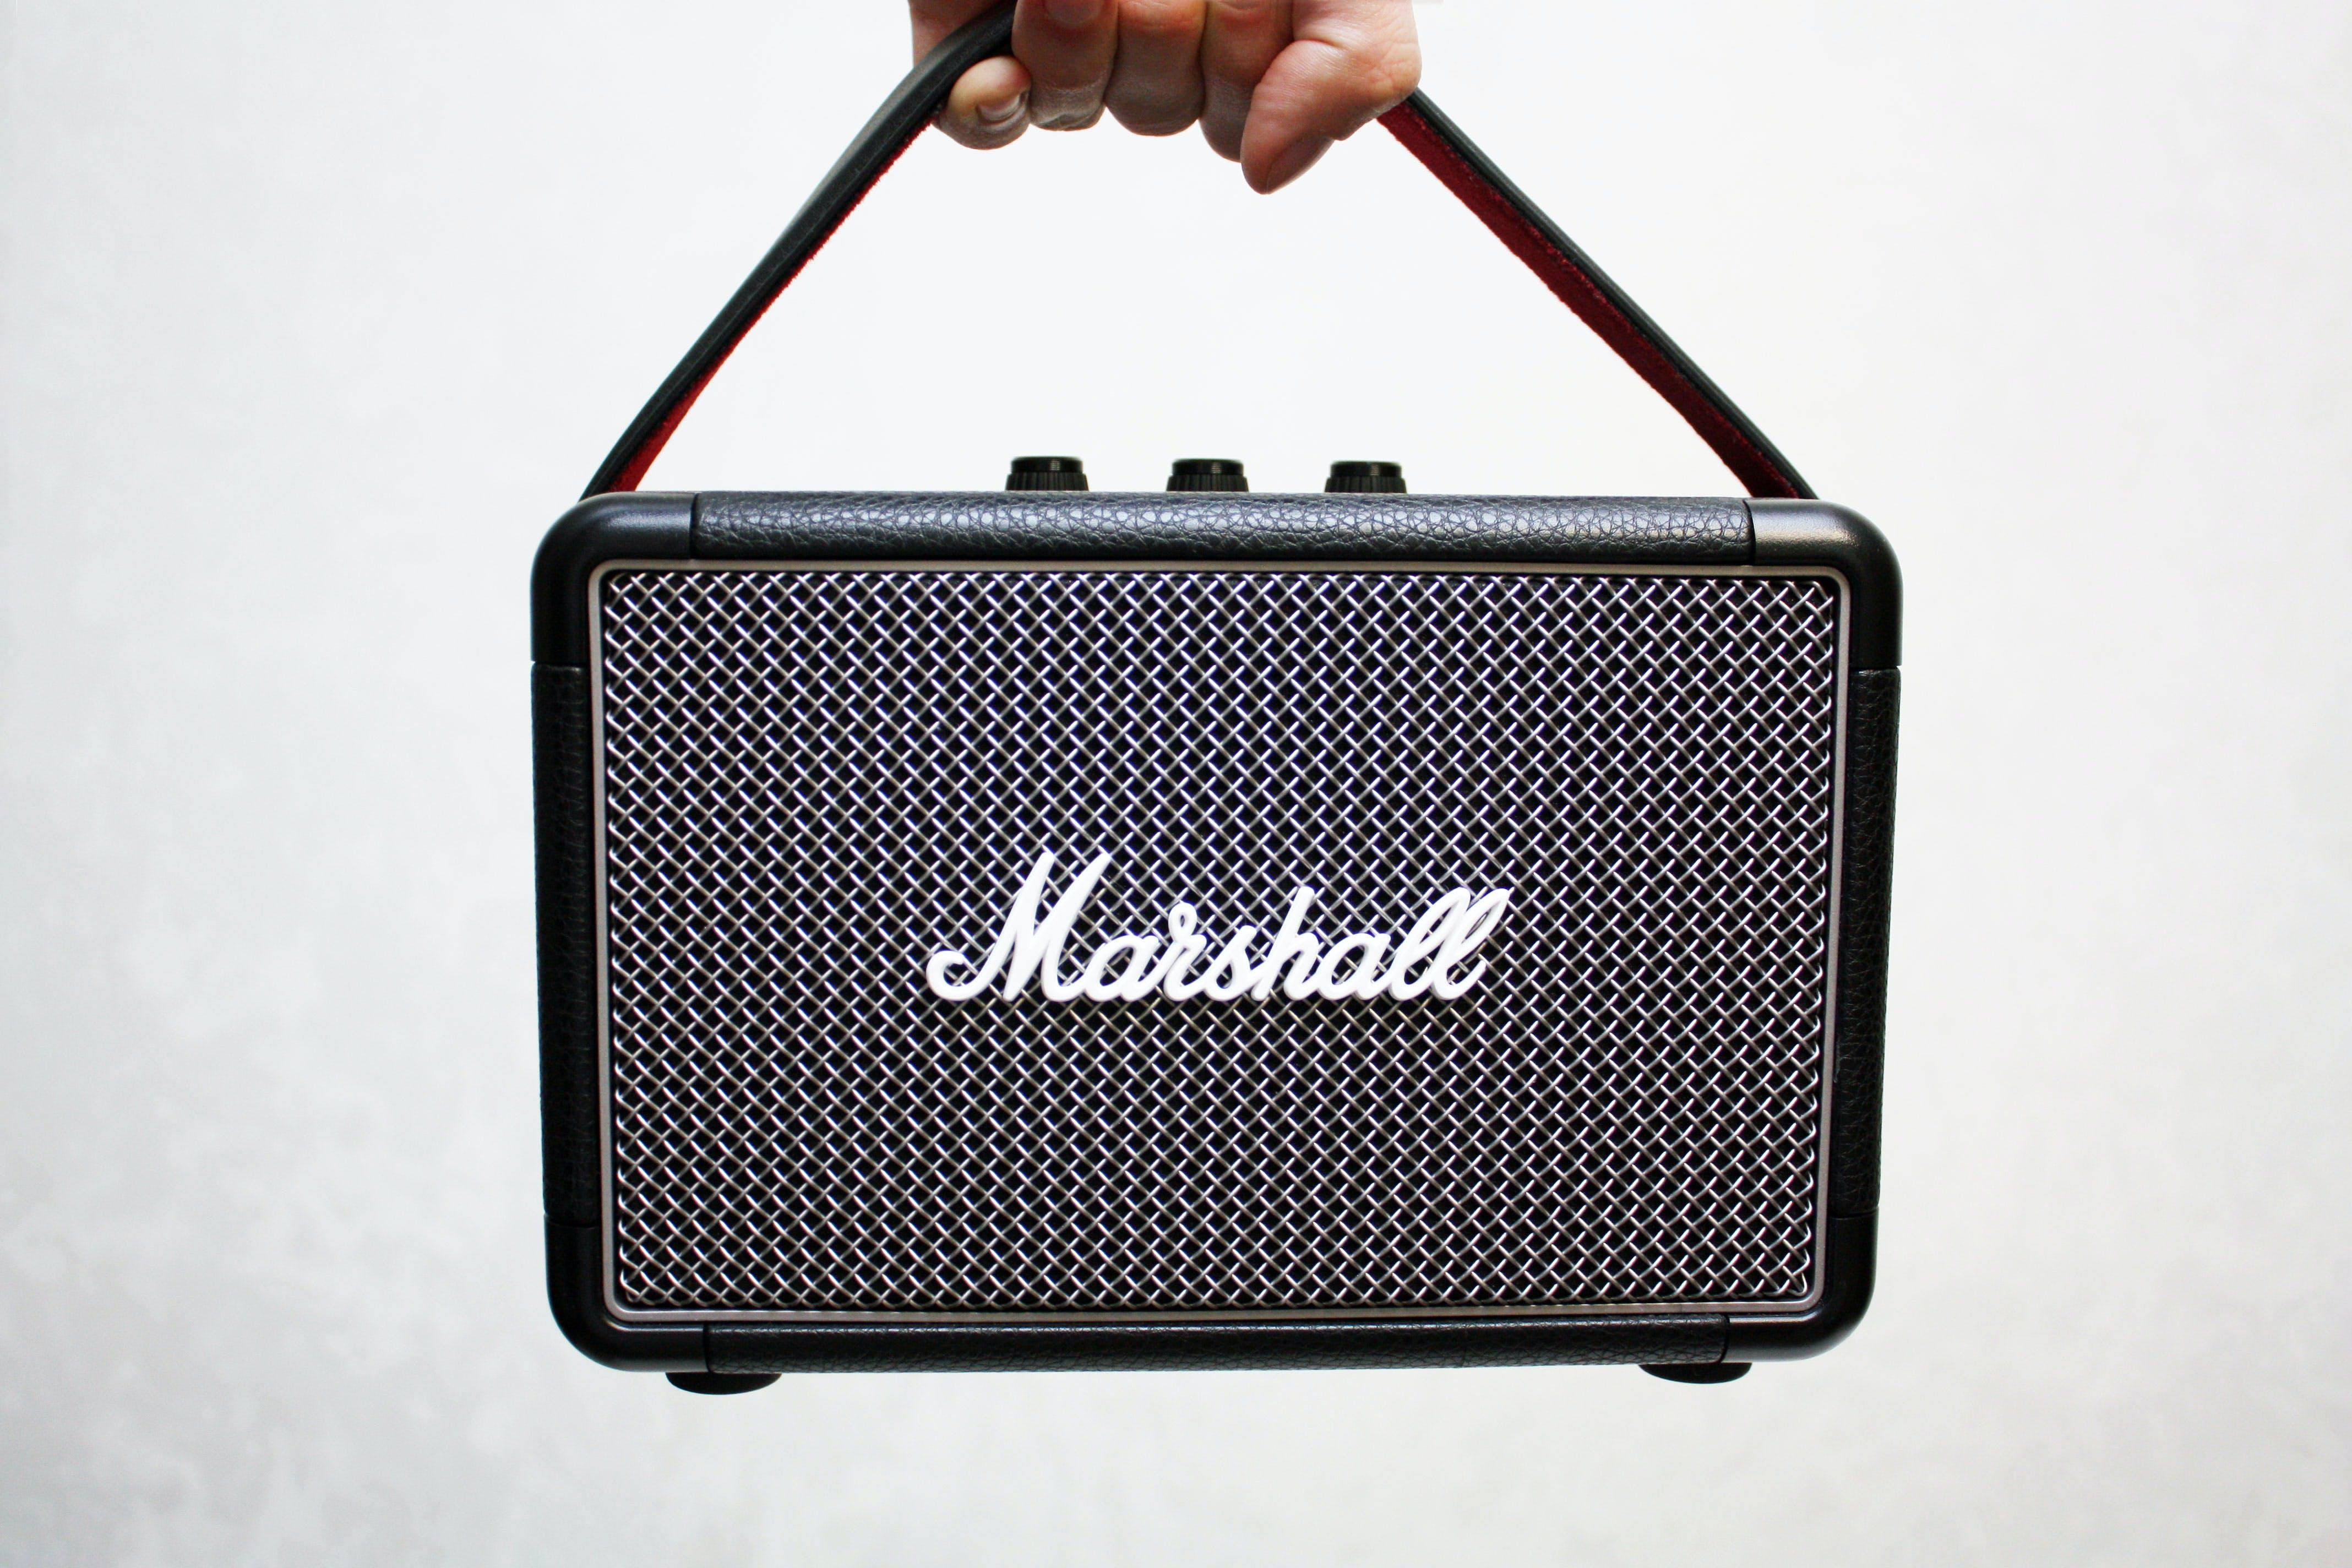 Black Marshall Portable Guitar Amplifier